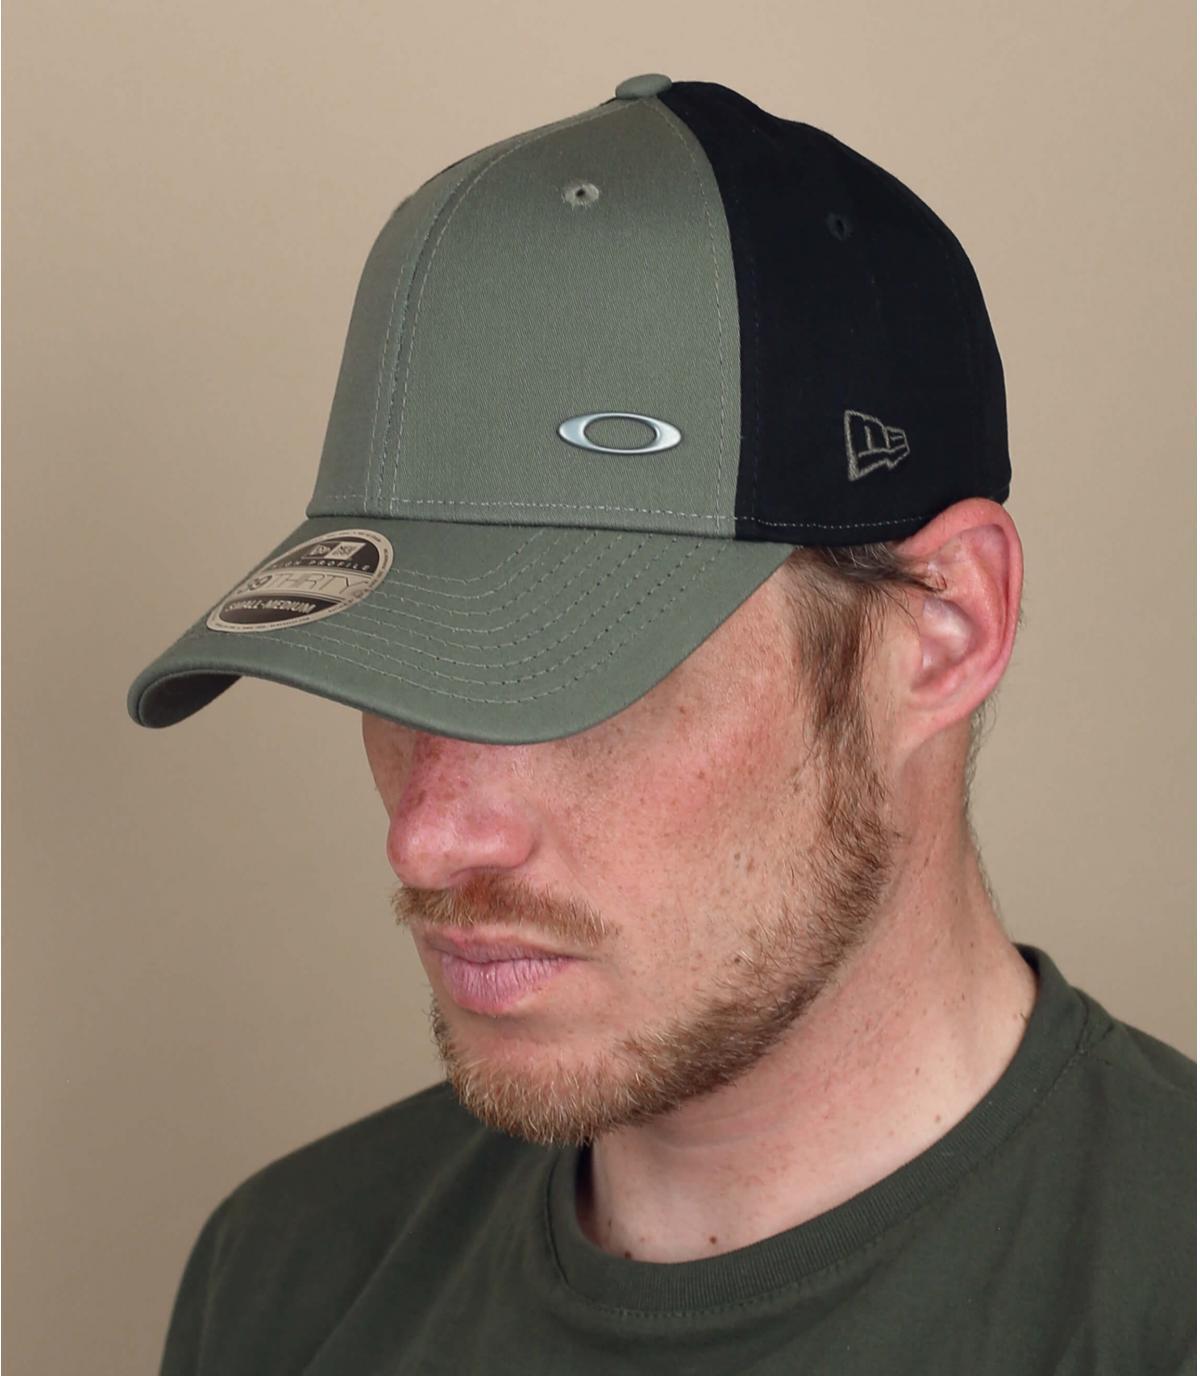 cappellino curvo Oakley verde